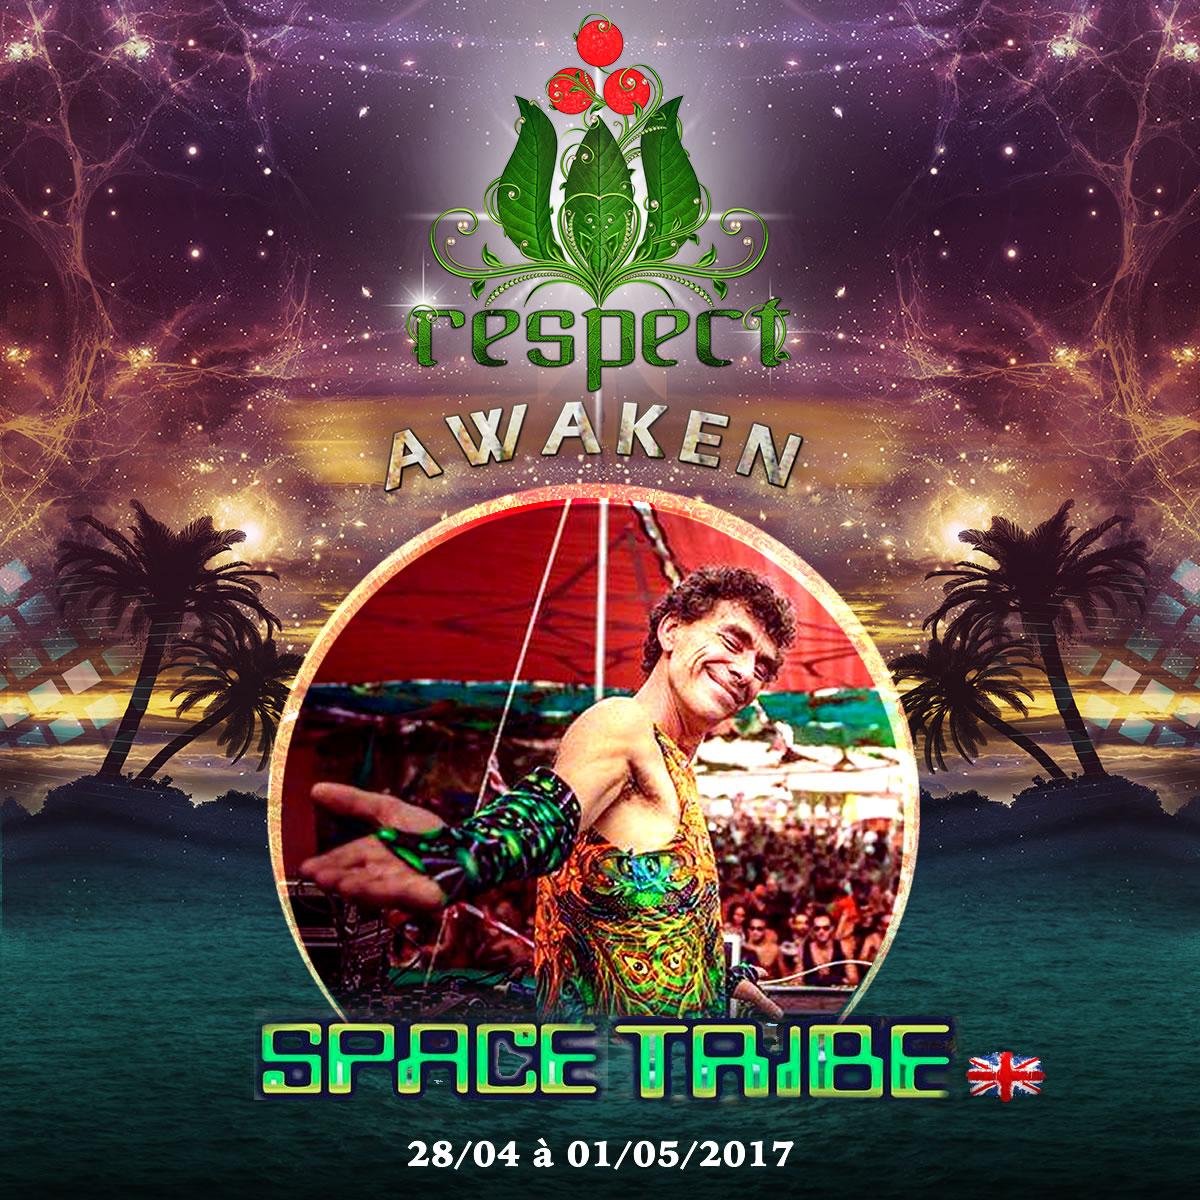 Space Tribe @ Respect Awaken 2017